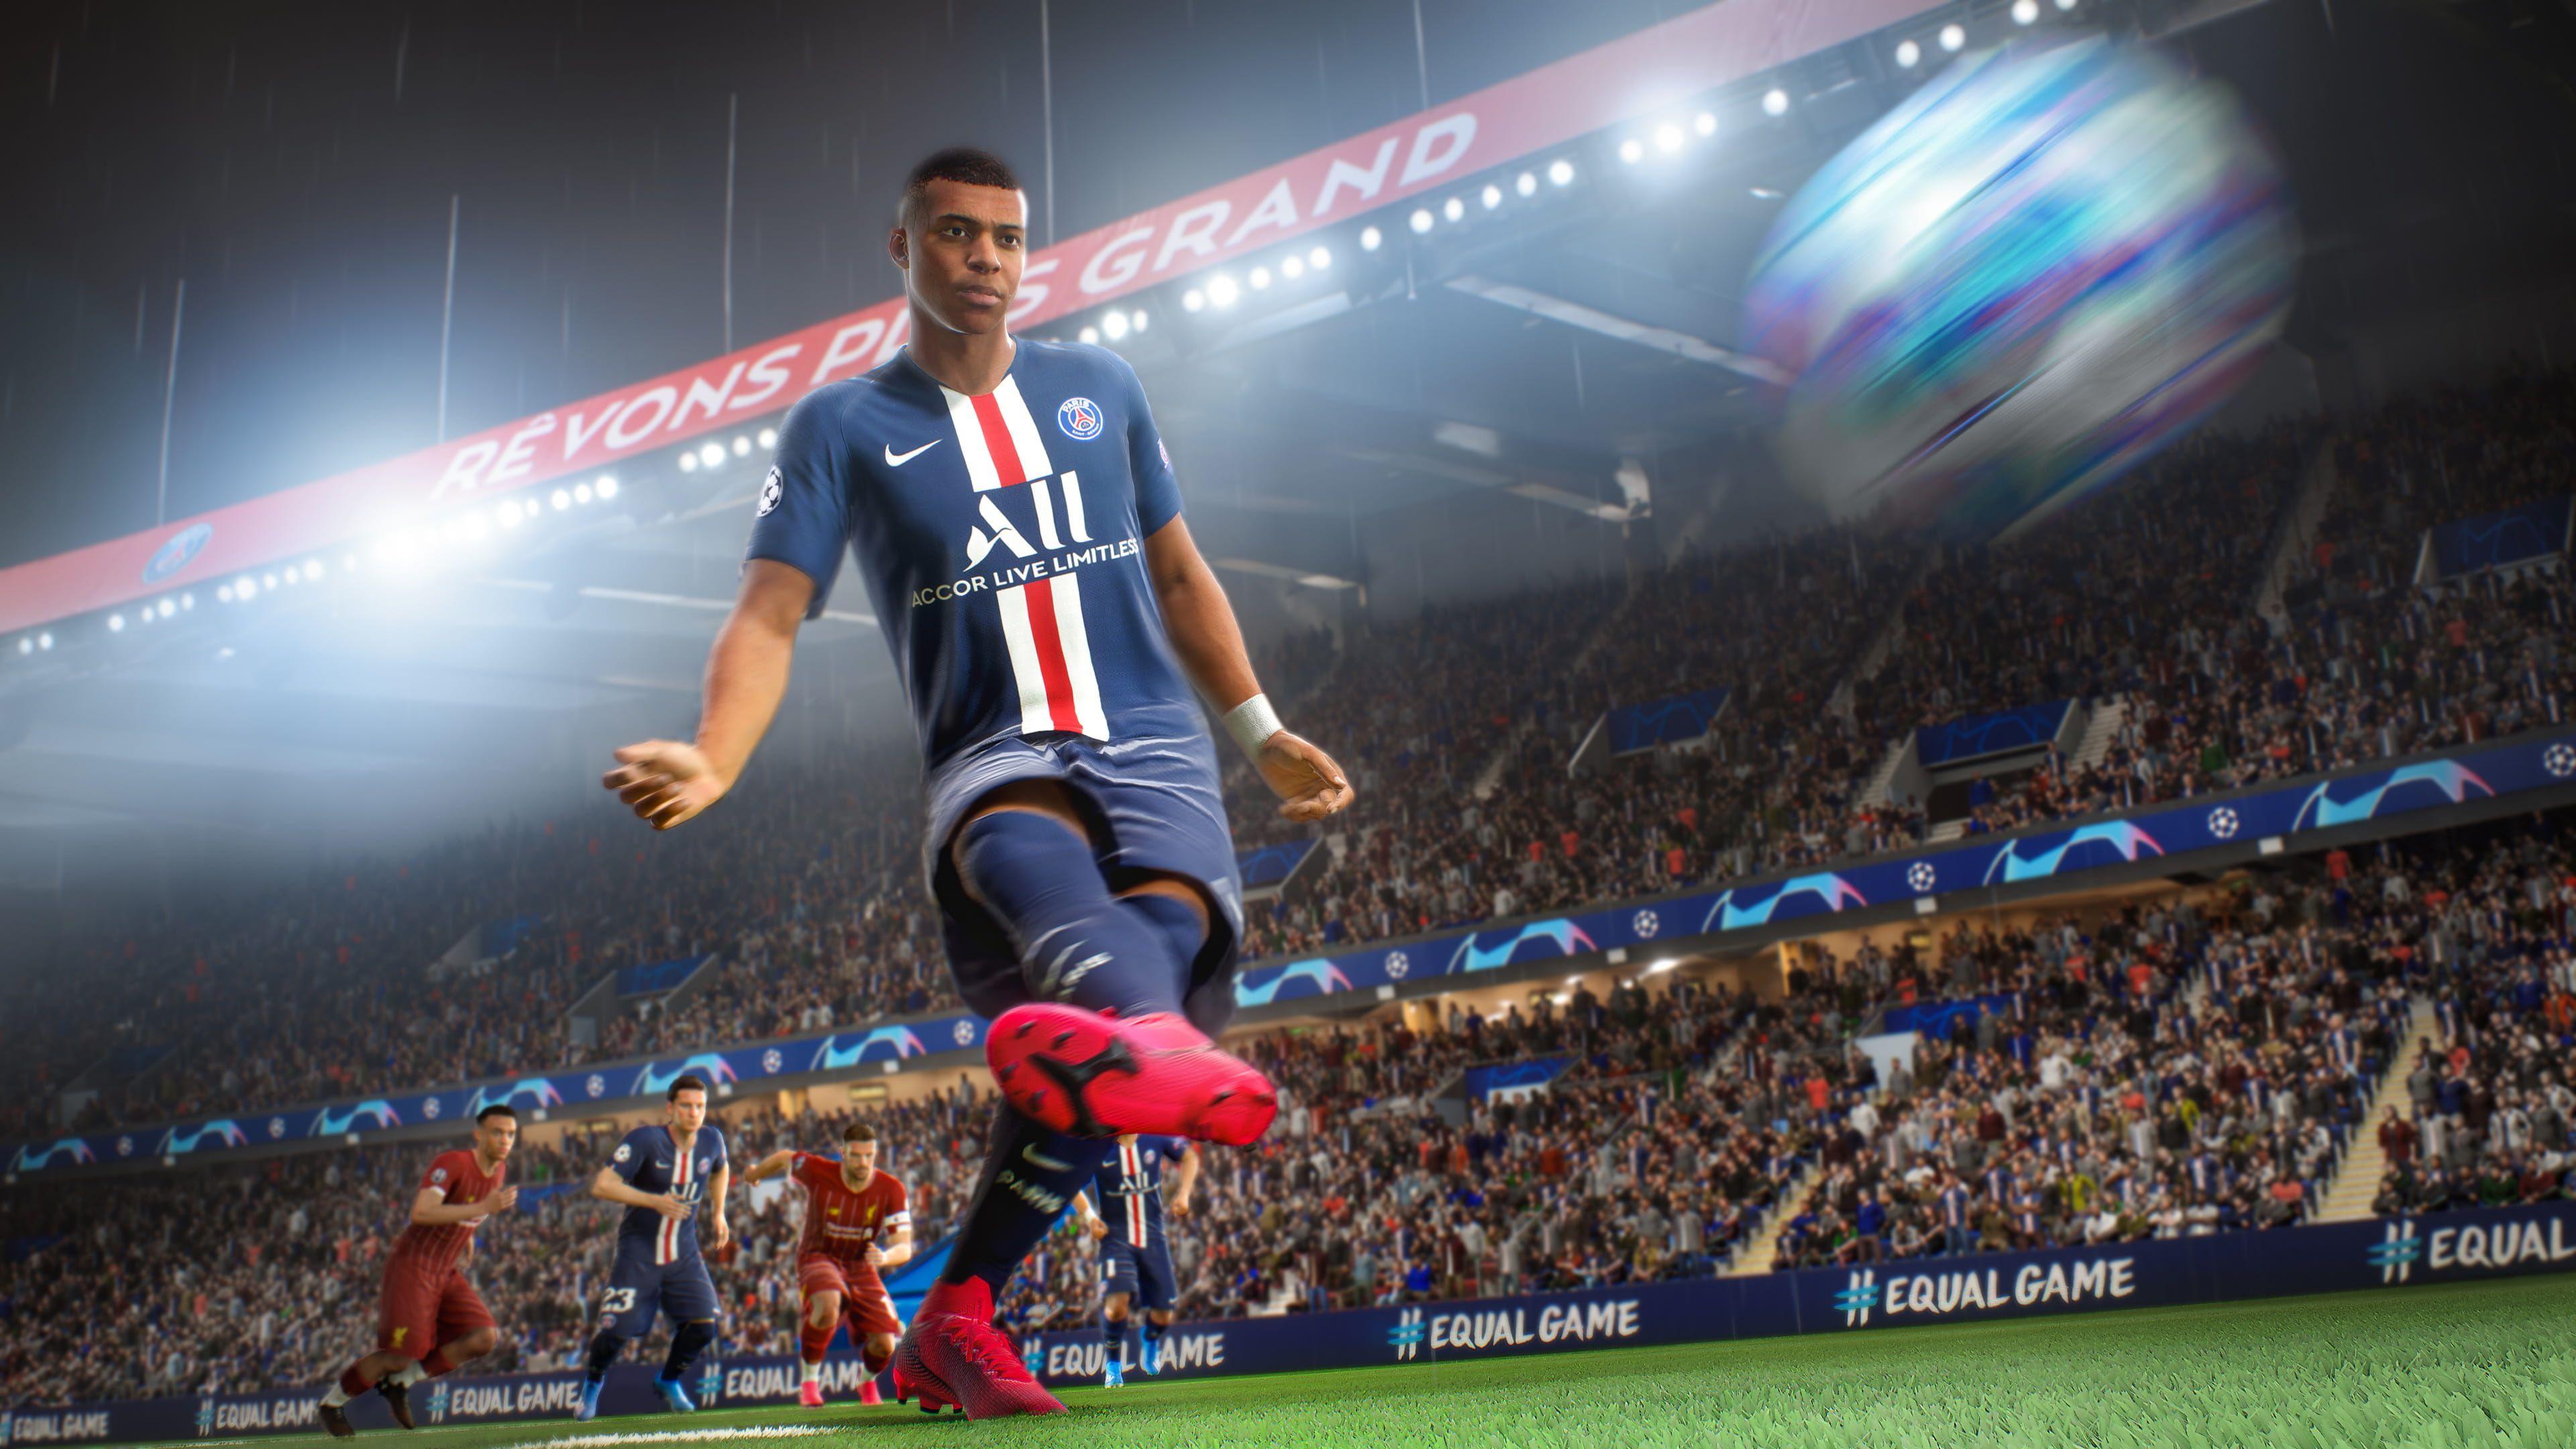 FIFA21 Wallpapers - Wallpaper Cave